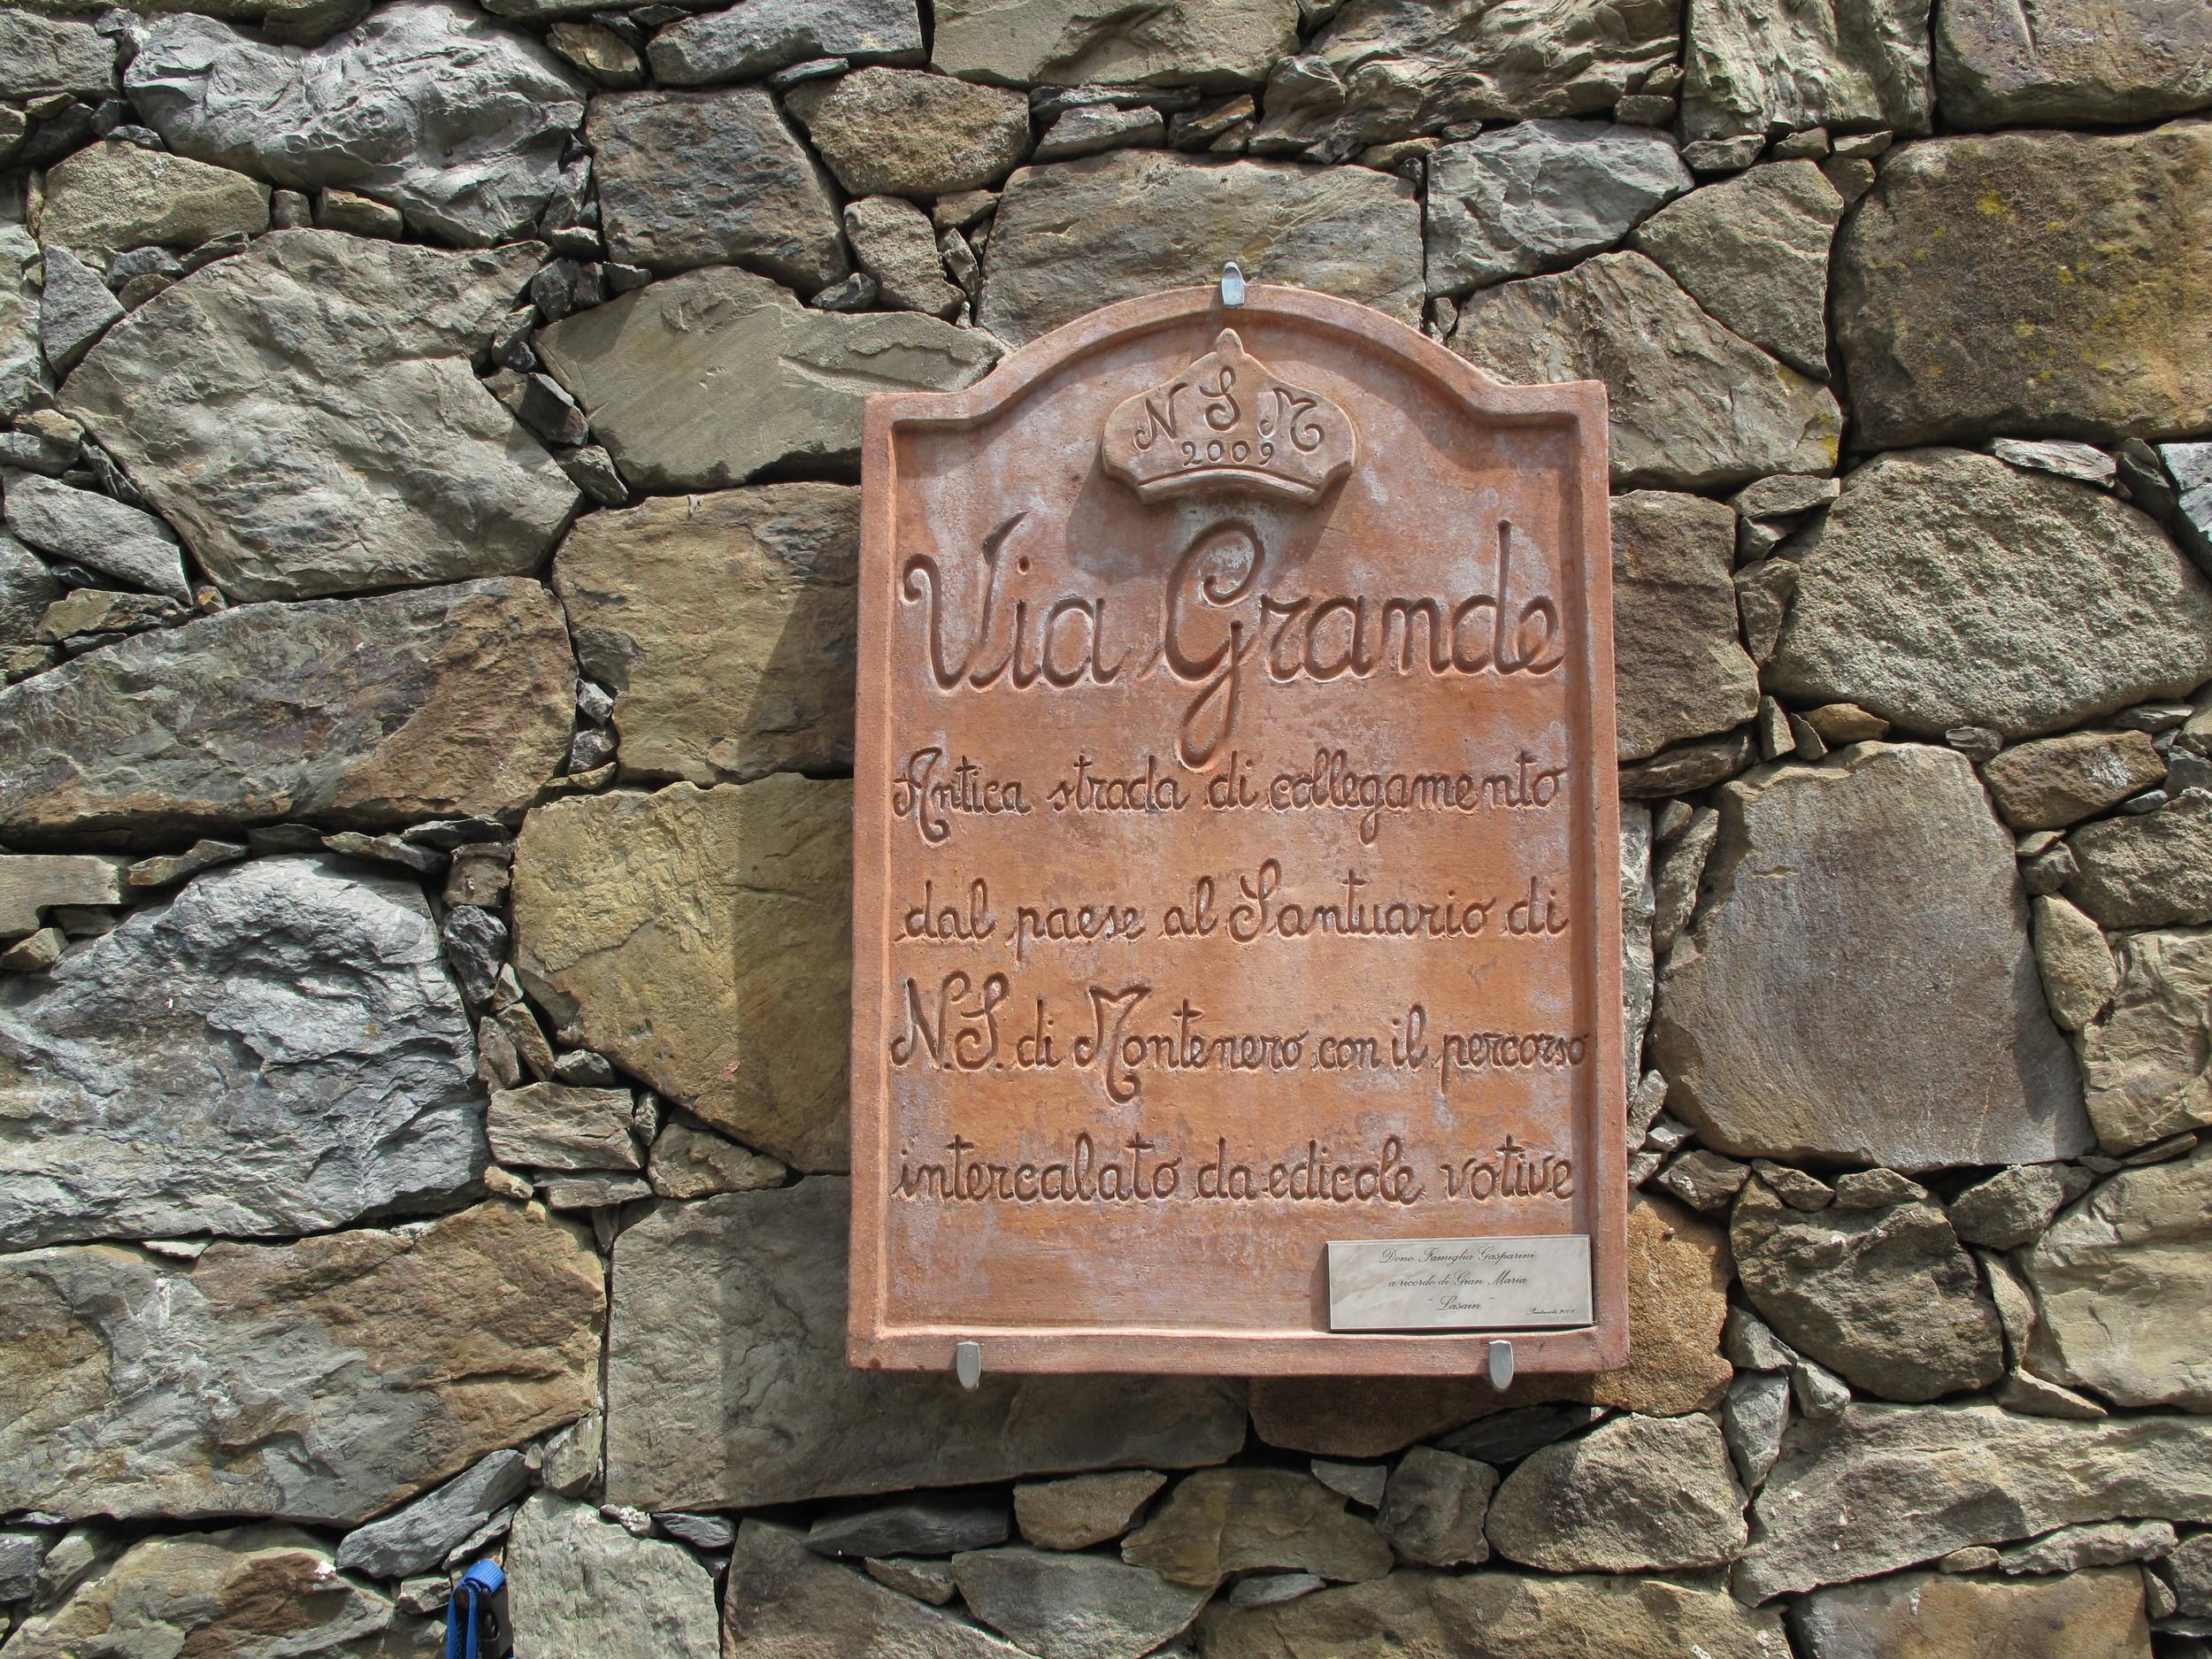 Sign for the Via Grande trail on the Cinque Terre